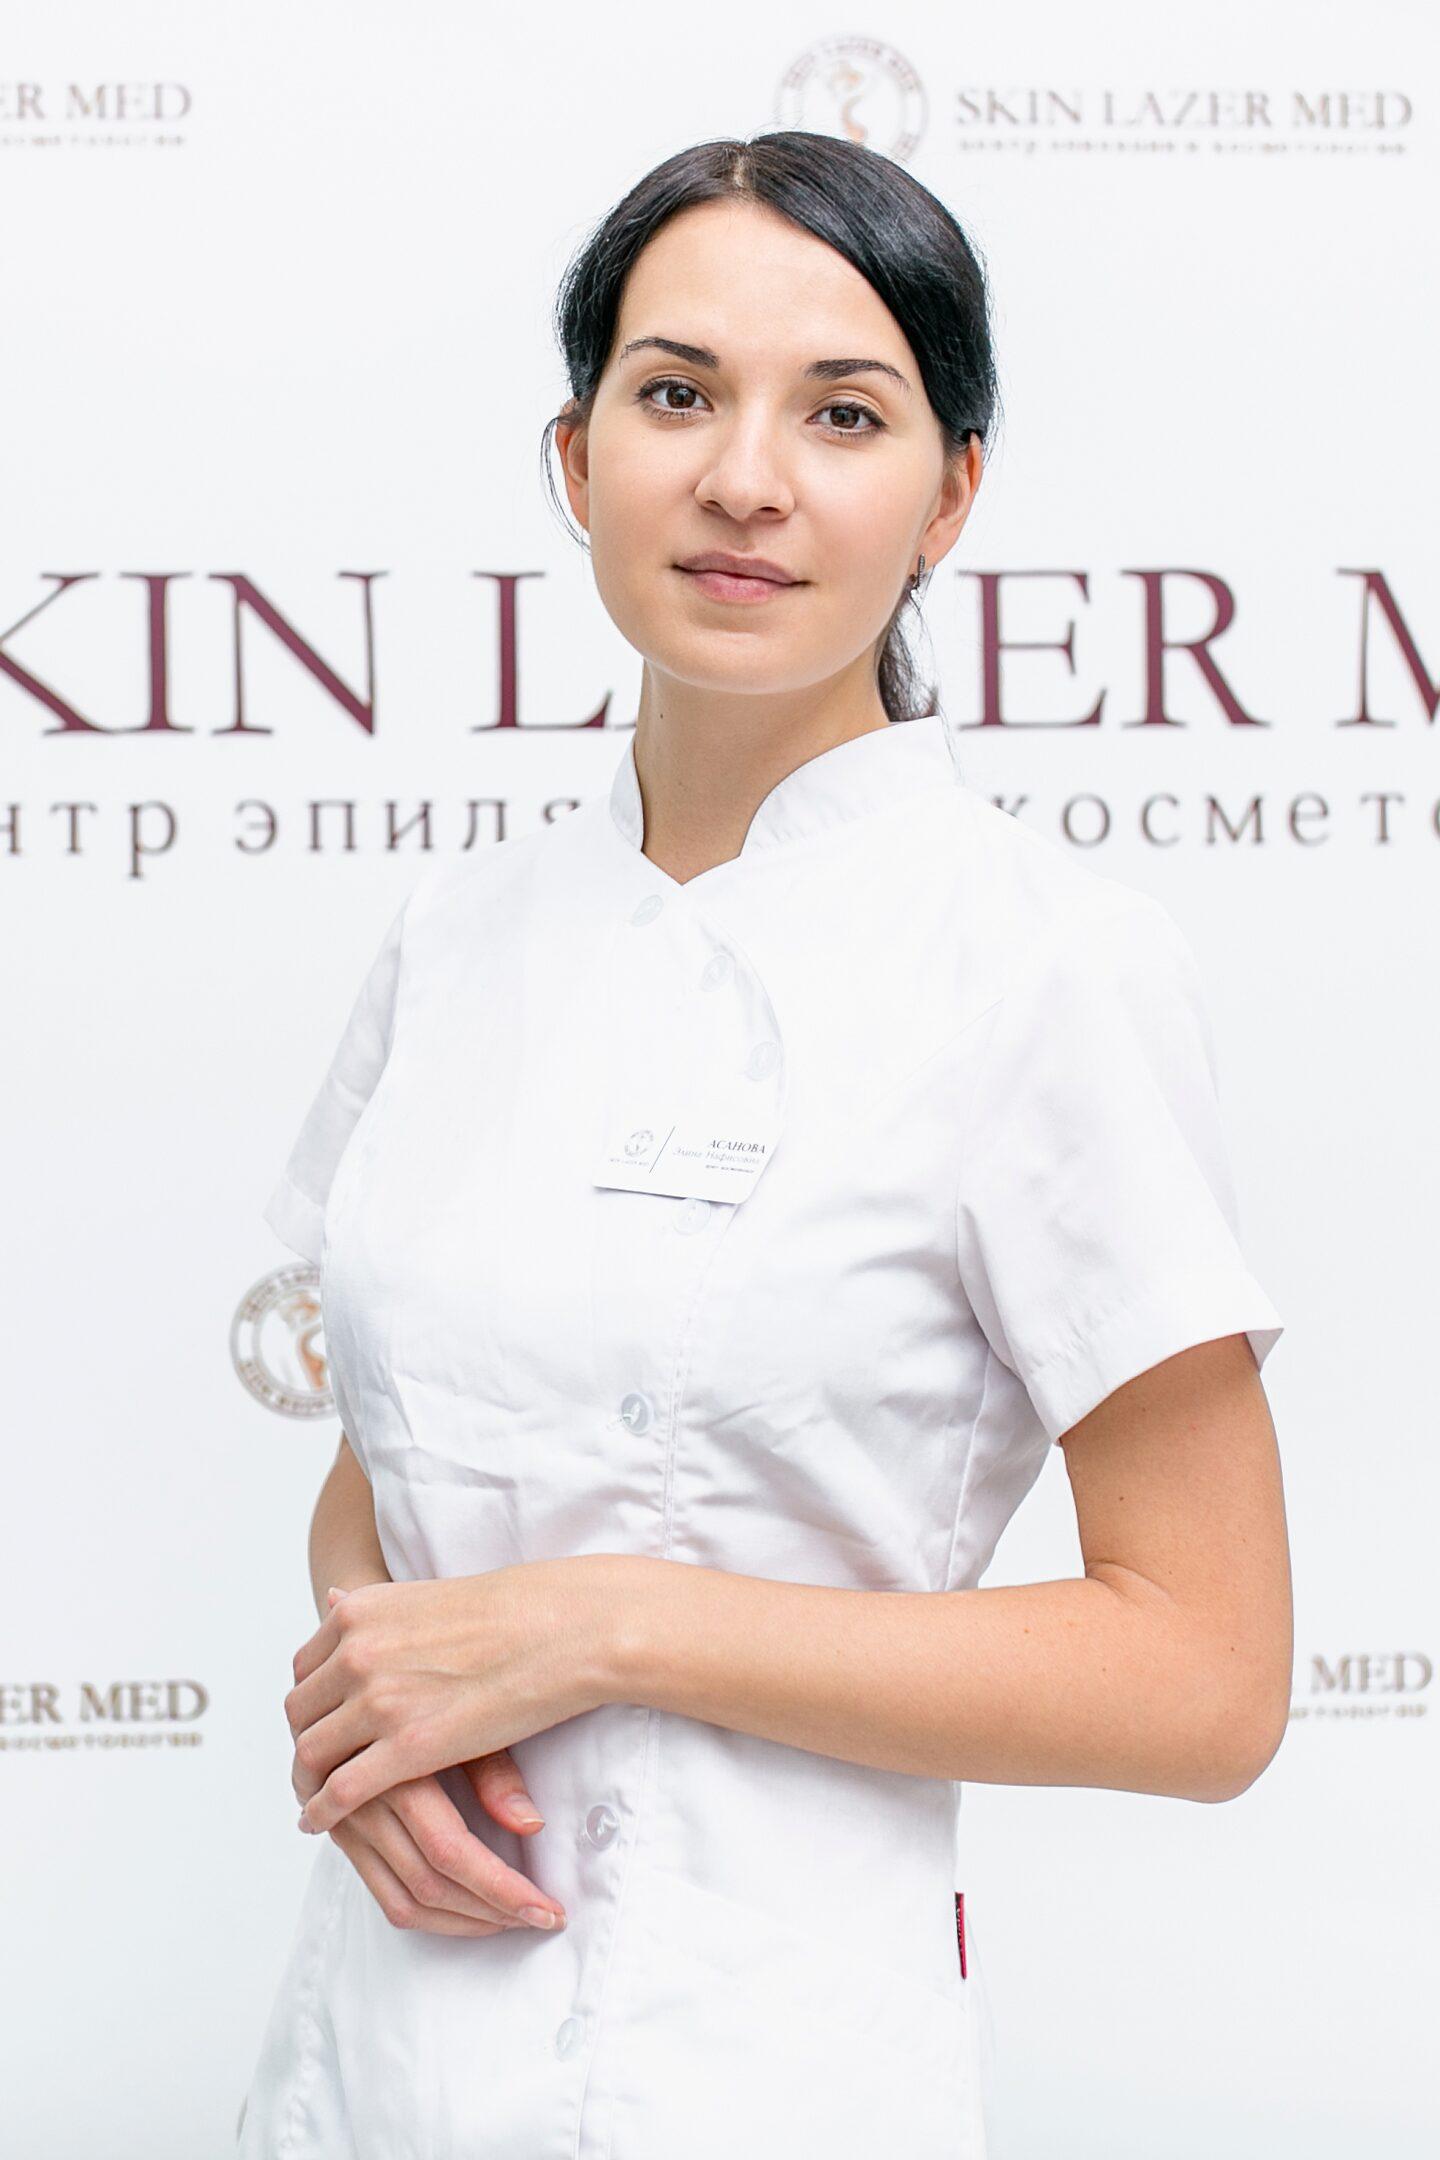 Асанова Элина Нафисовна, врач косметолог, дерматолог